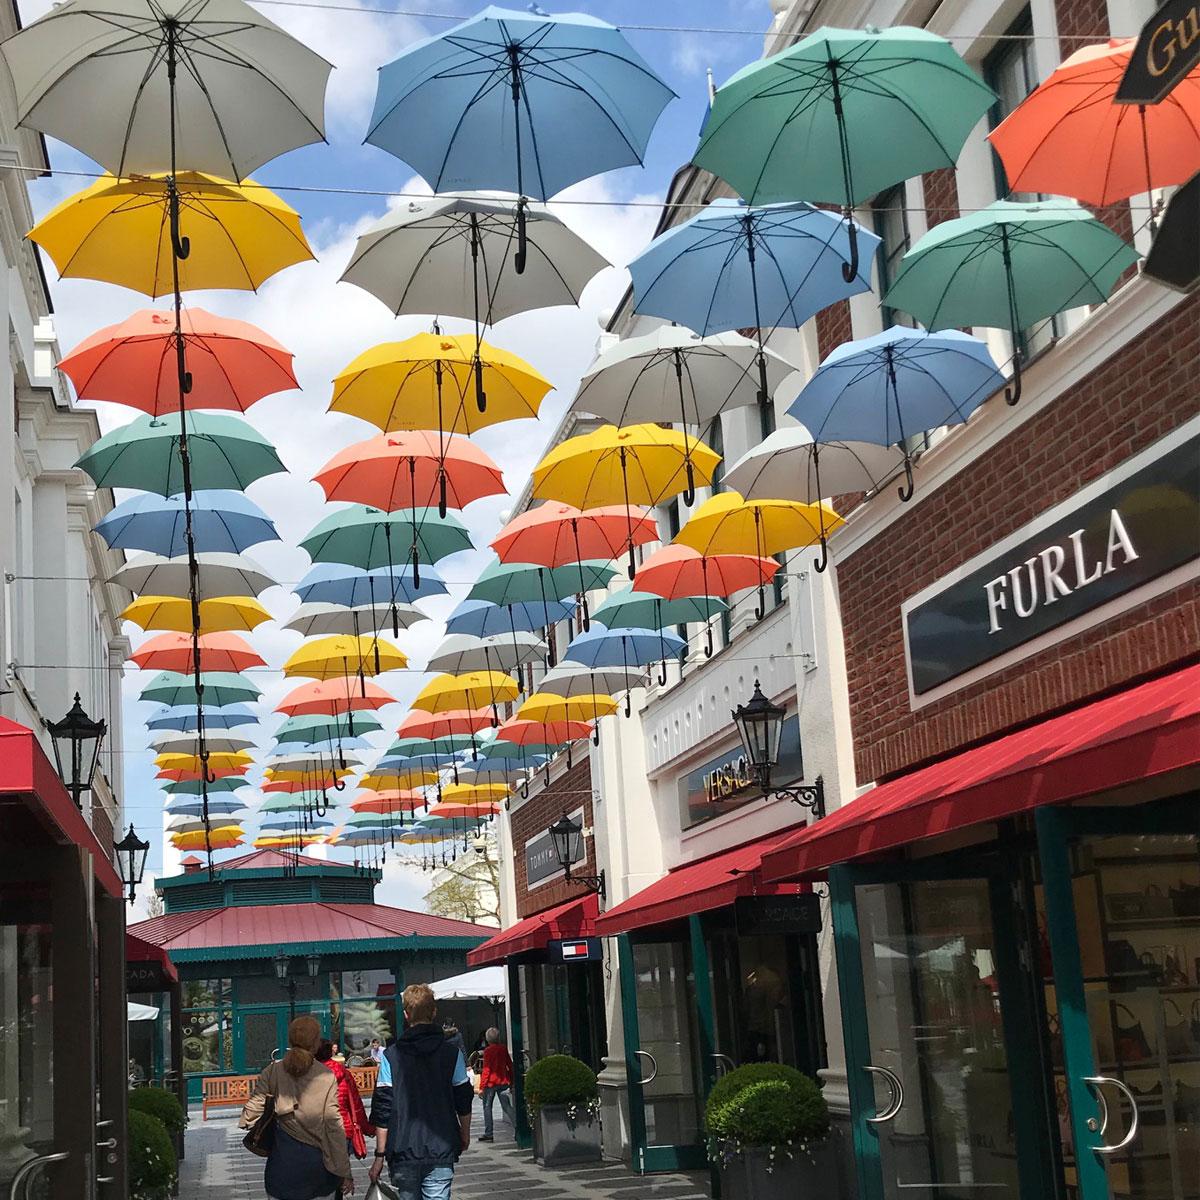 Promenad under paraplyer